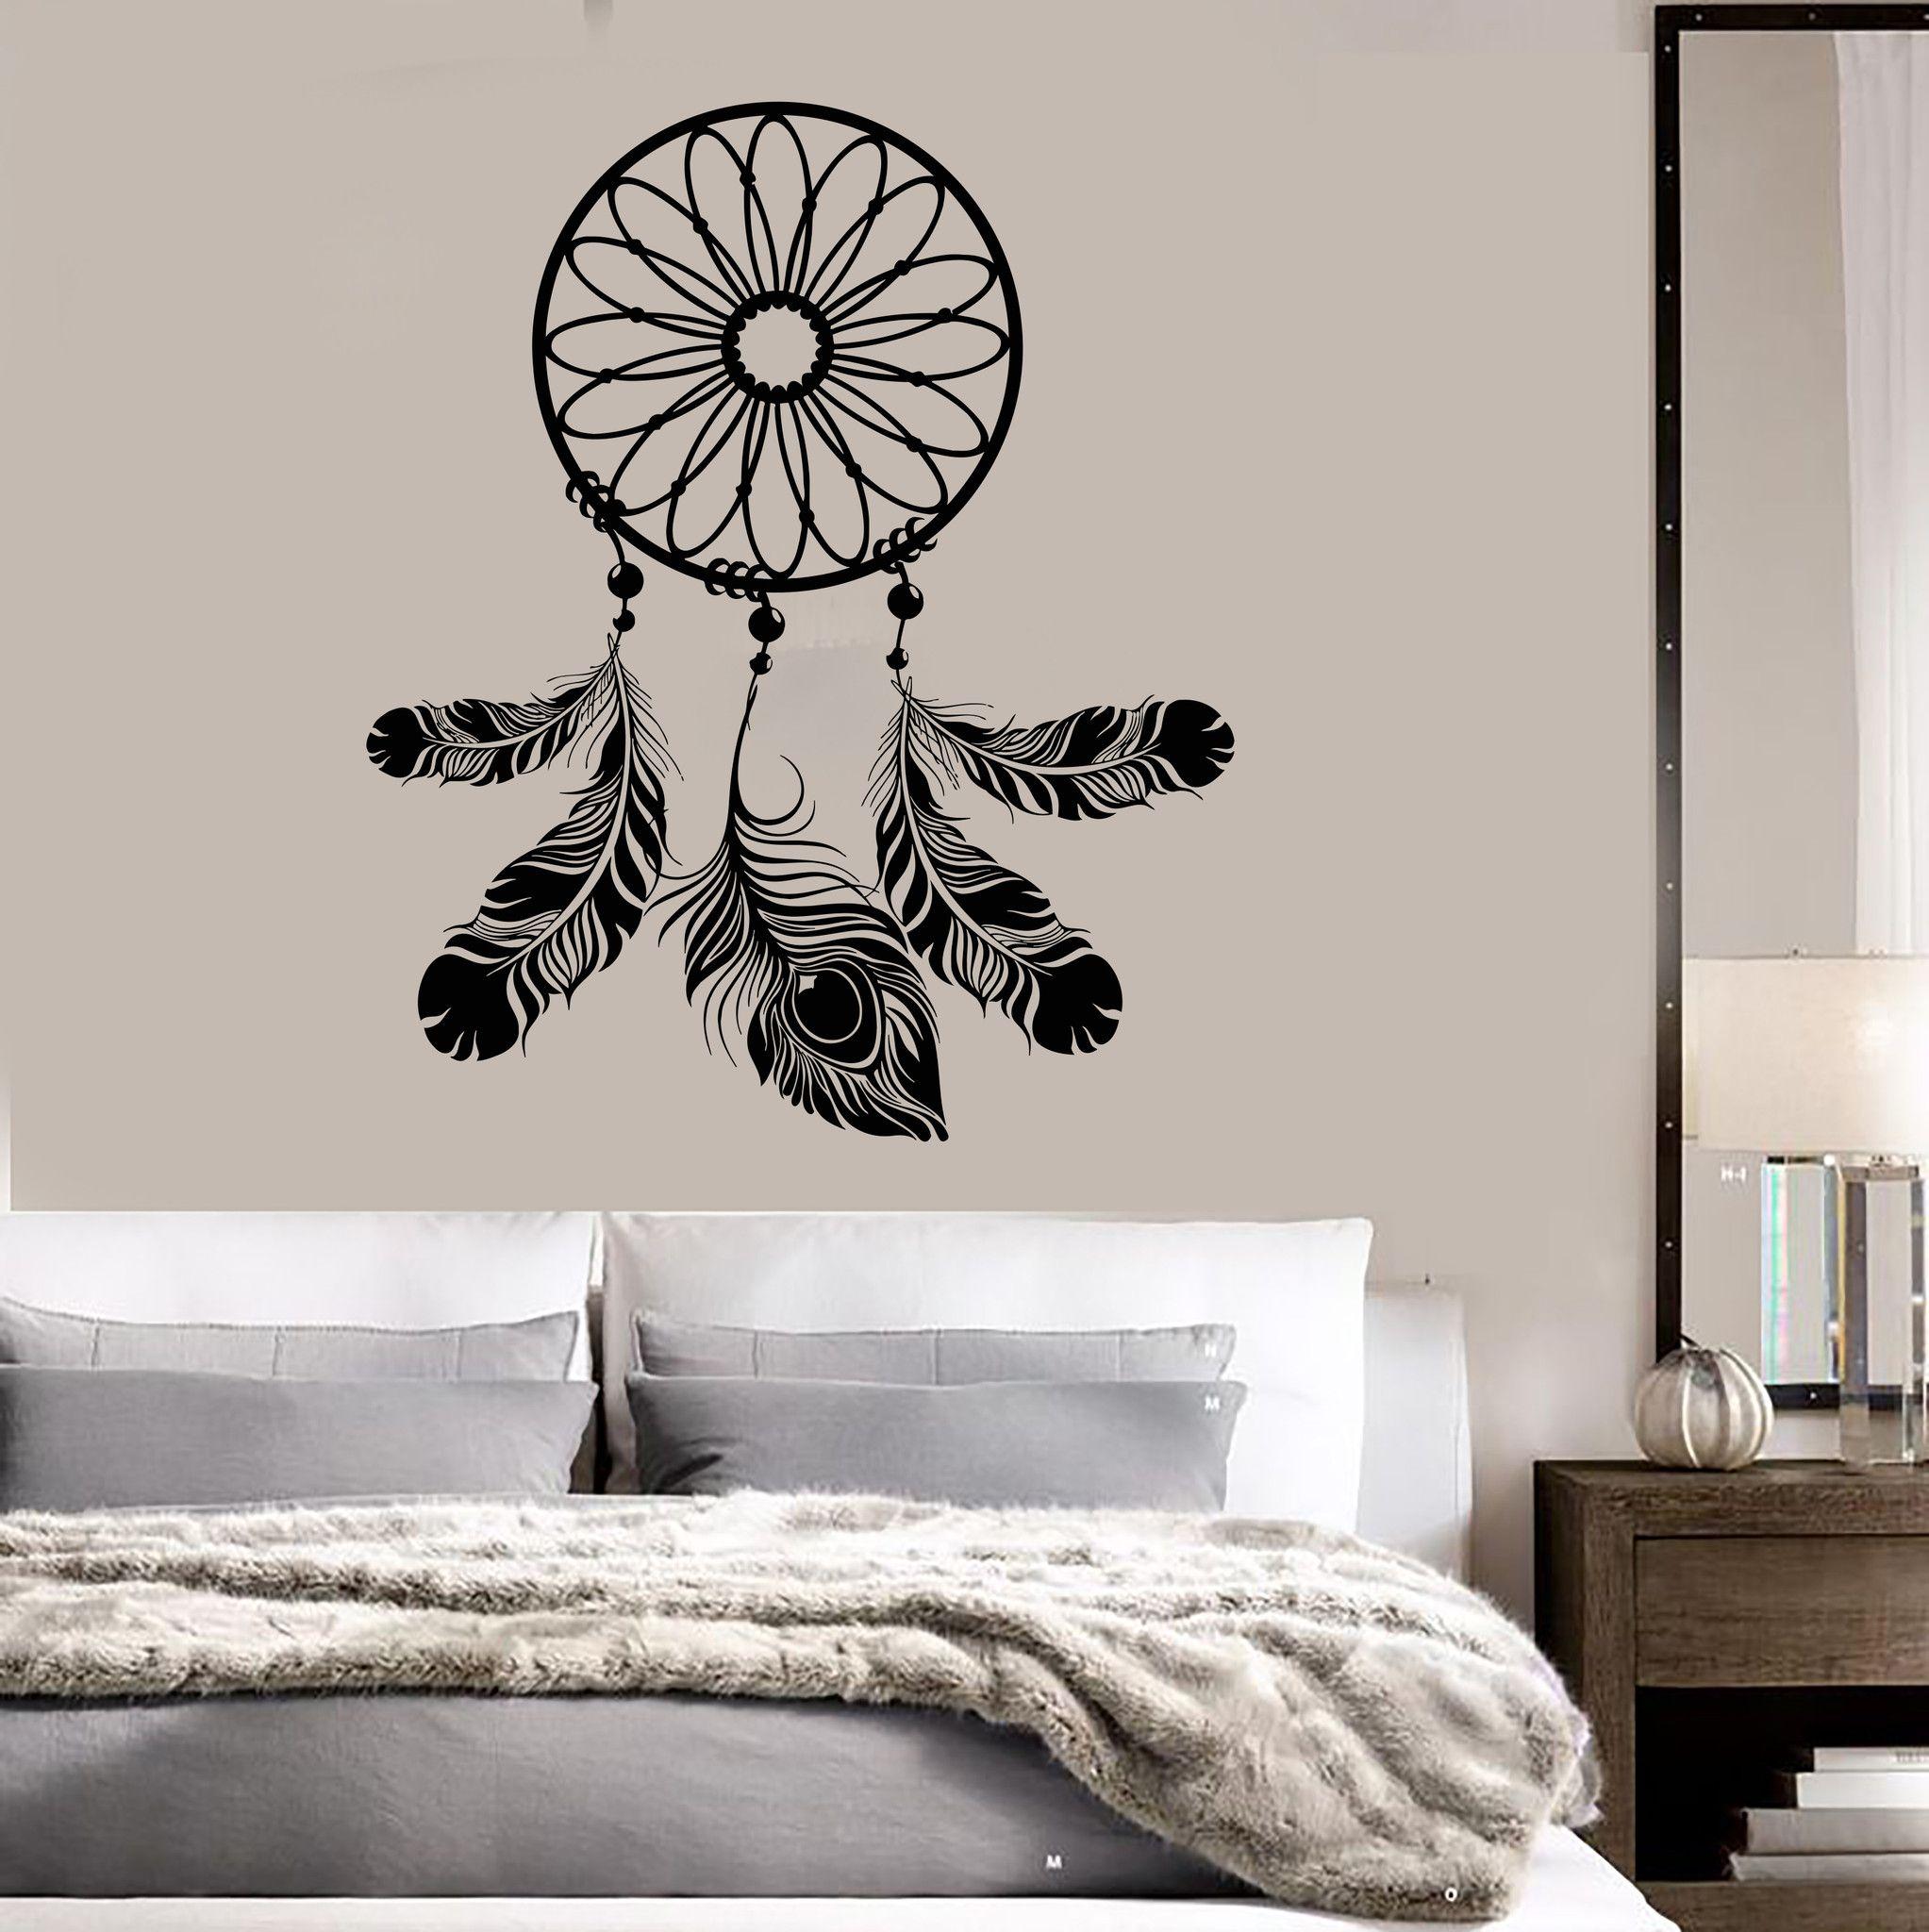 Dreamcatcher Bedroom Decor Talisman Art Dream Catcher Wall Vinyl